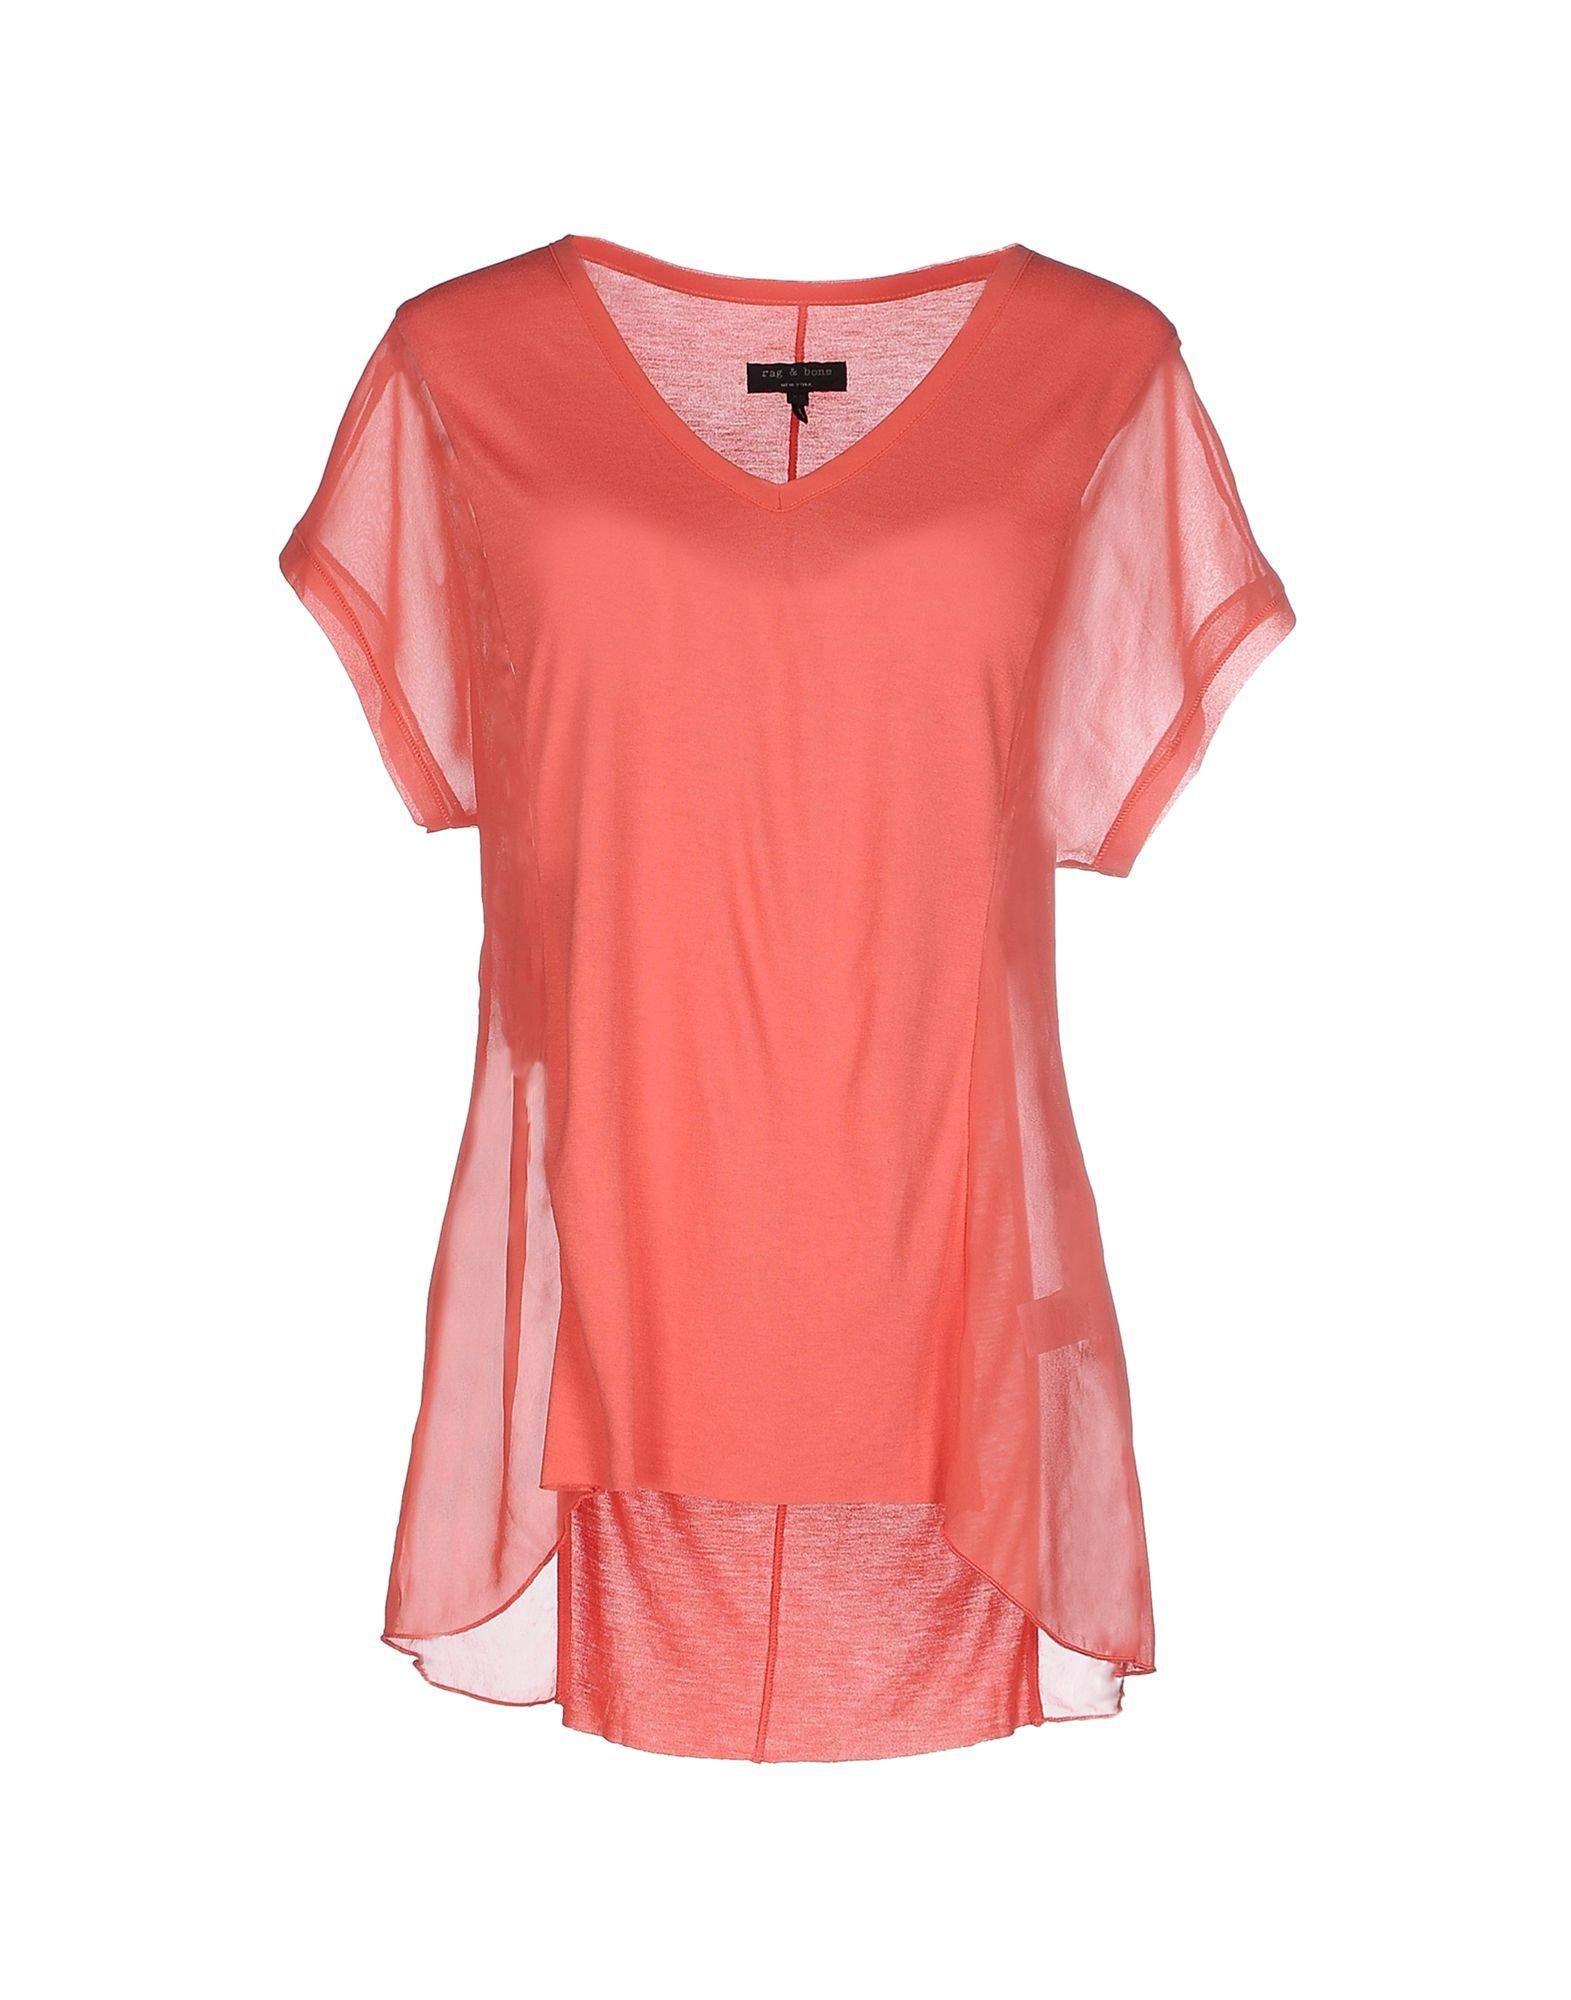 Rag bone t shirt in pink lyst for Rag and bone mens shirts sale